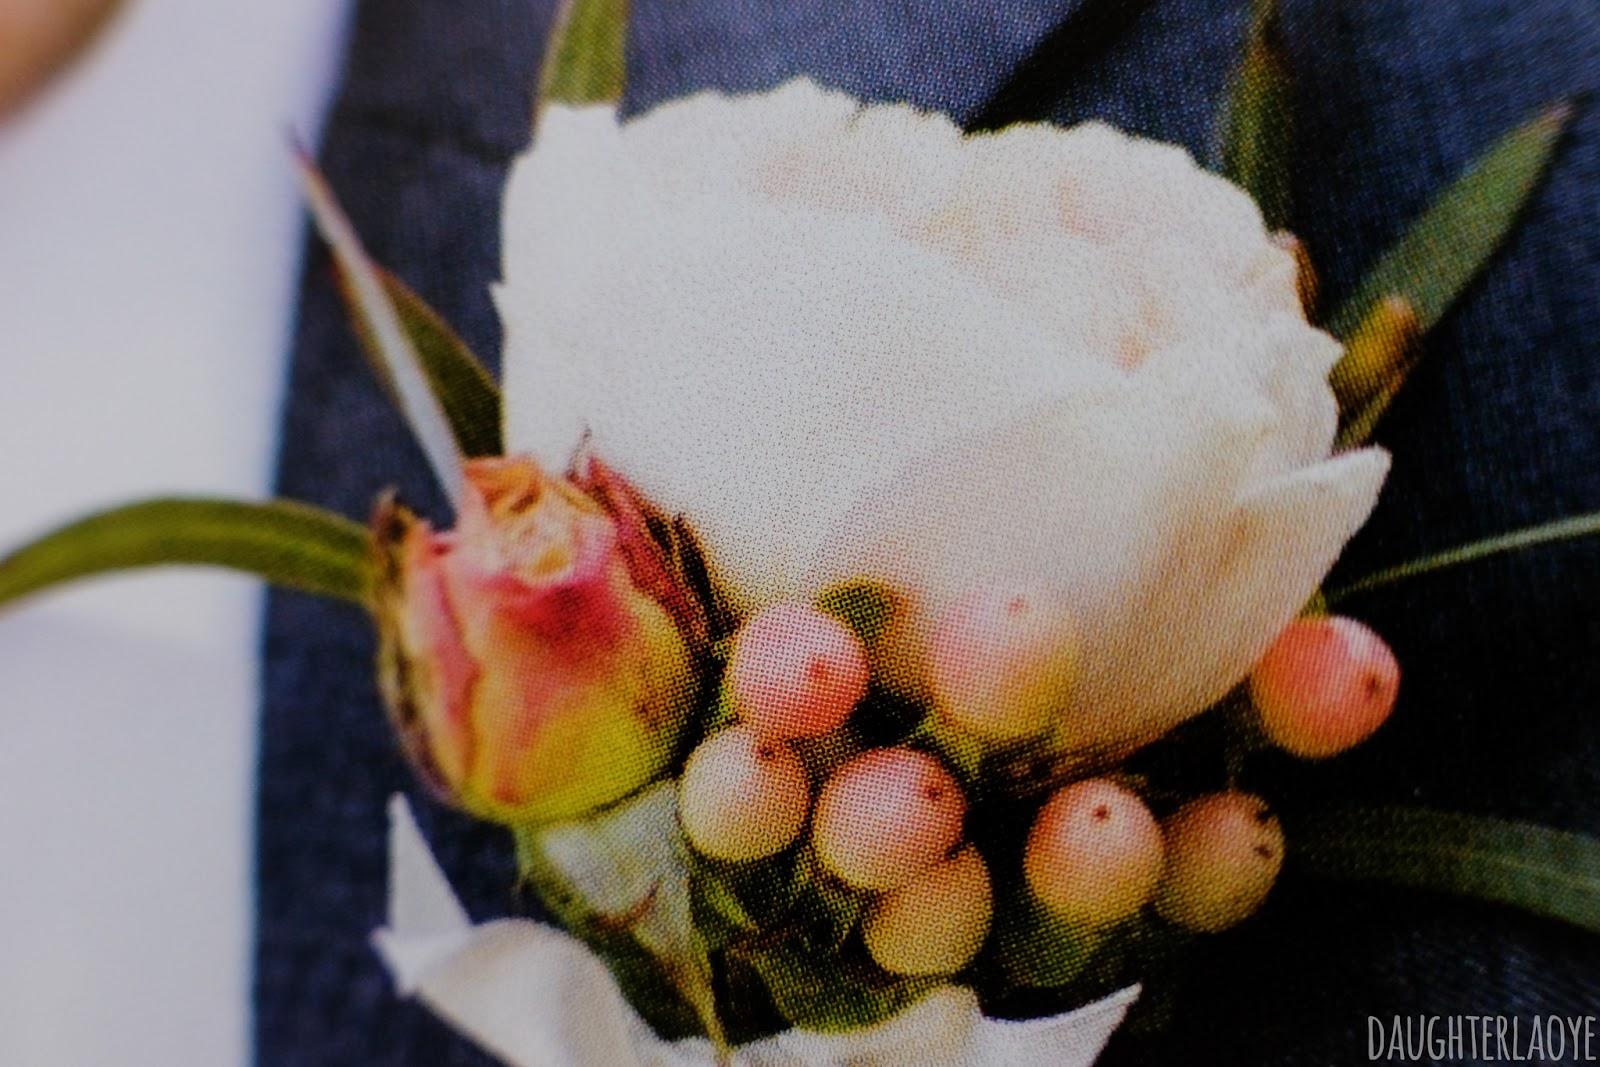 Daughter Lao Ye: Photobook Review: MILK Photo Book (Paper)